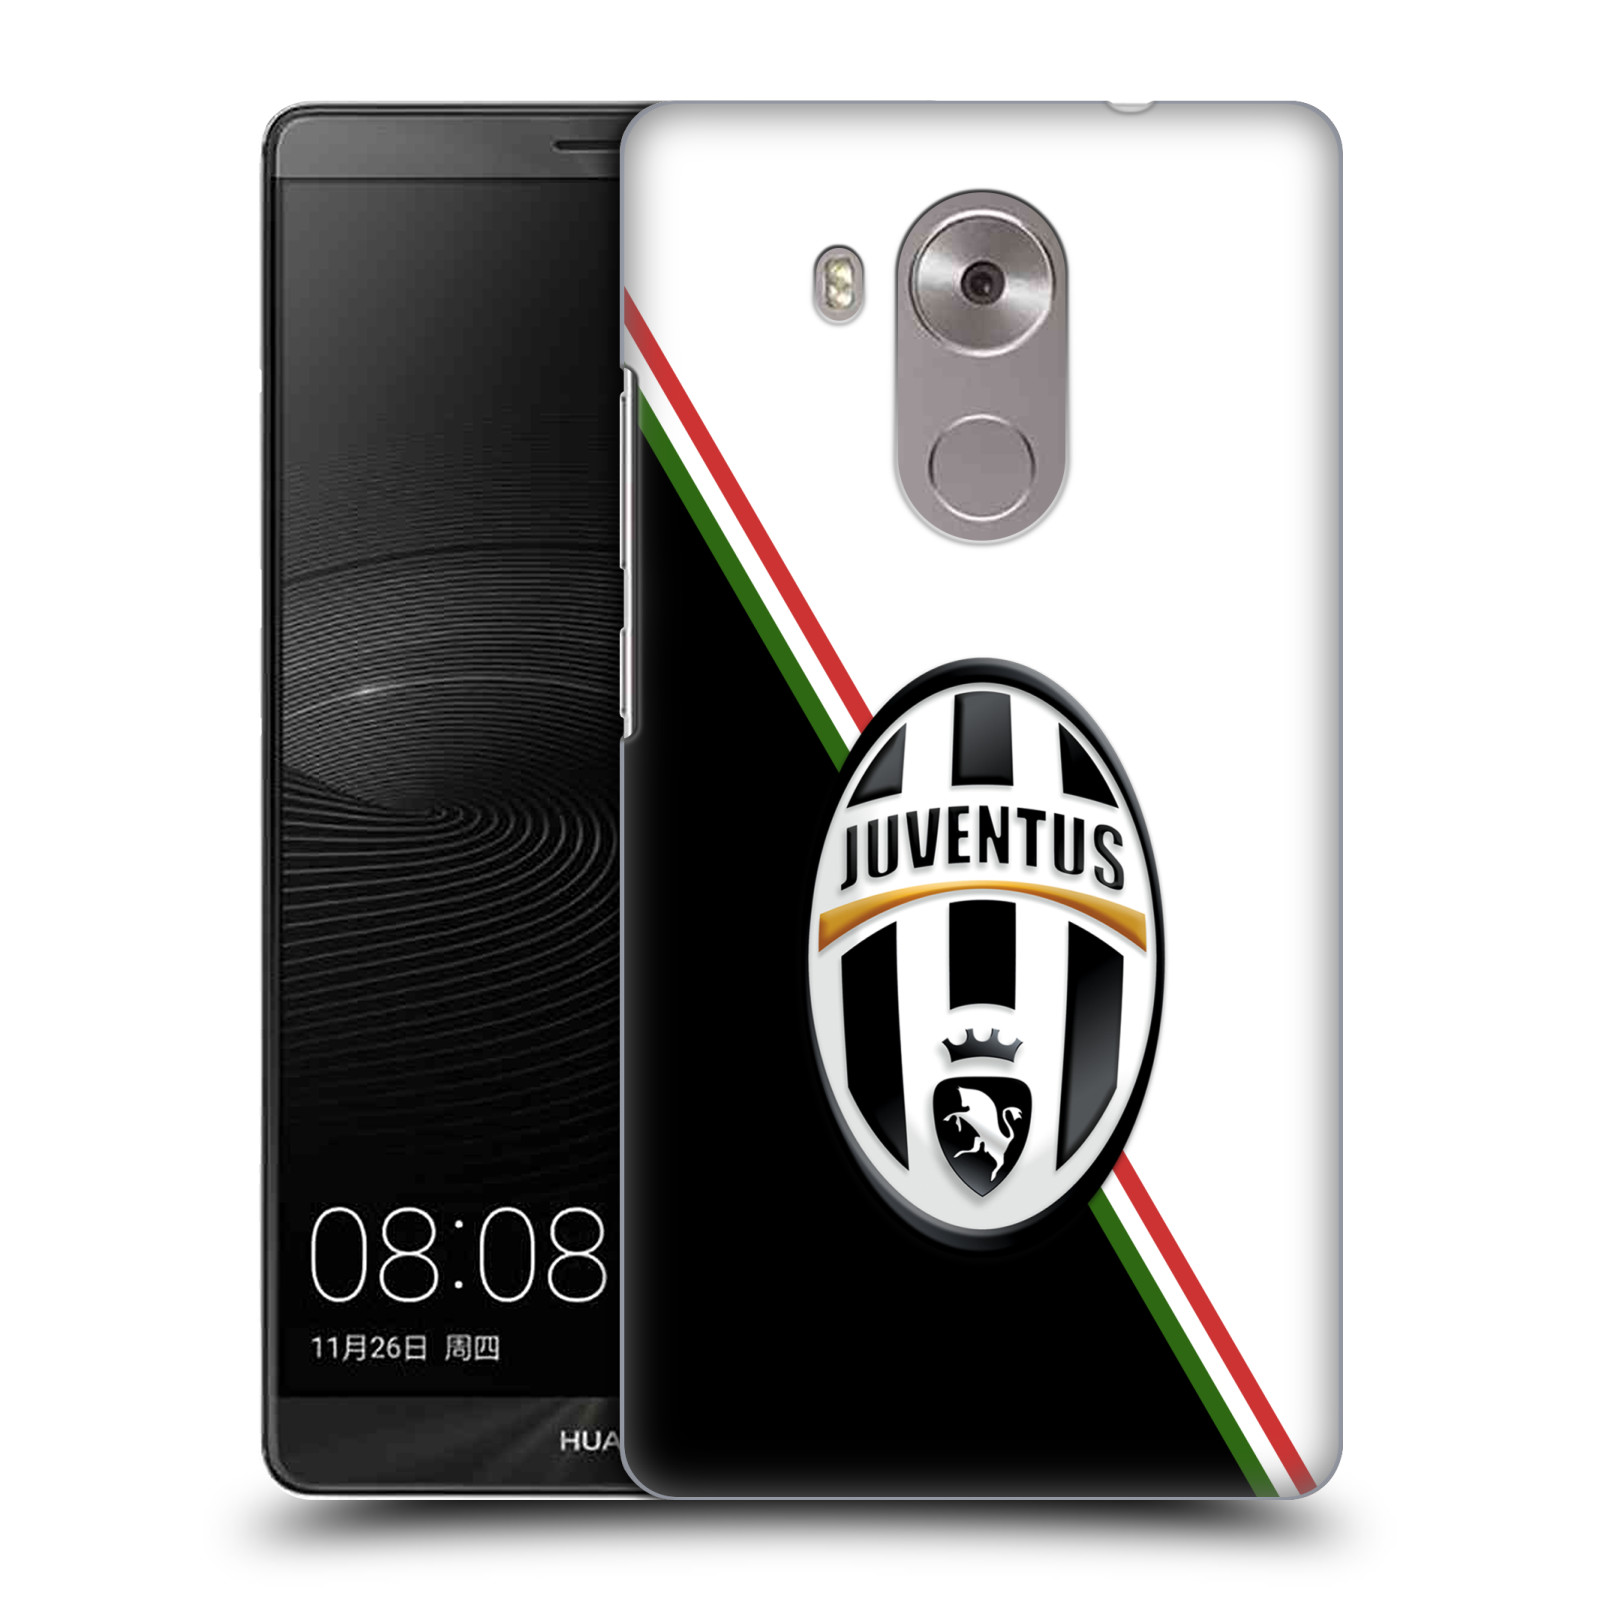 Plastové pouzdro na mobil Huawei Mate 8 HEAD CASE Juventus FC - Black and White (Plastový kryt či obal na mobilní telefon Juventus FC Official pro Huawei Ascend MATE8)